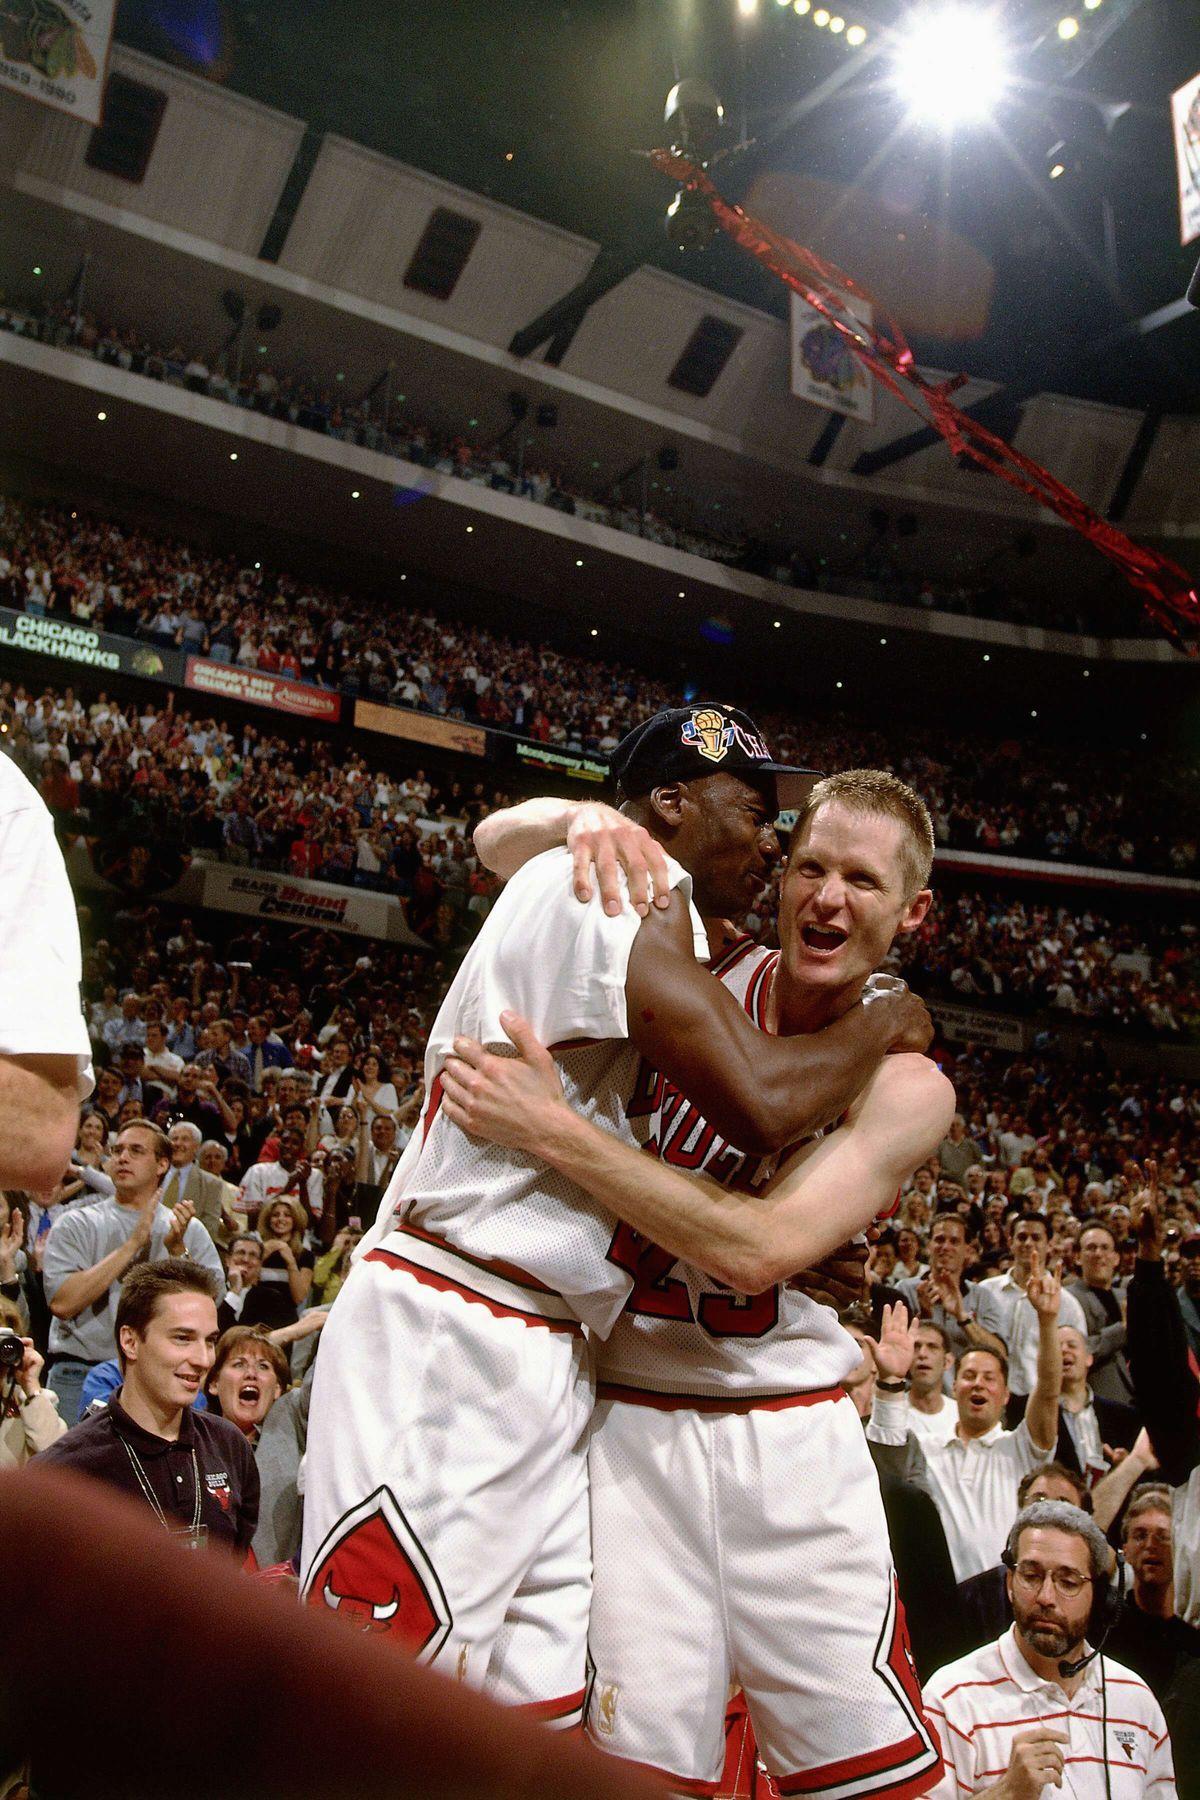 Steve Kerr celebrates with Michael Jordan